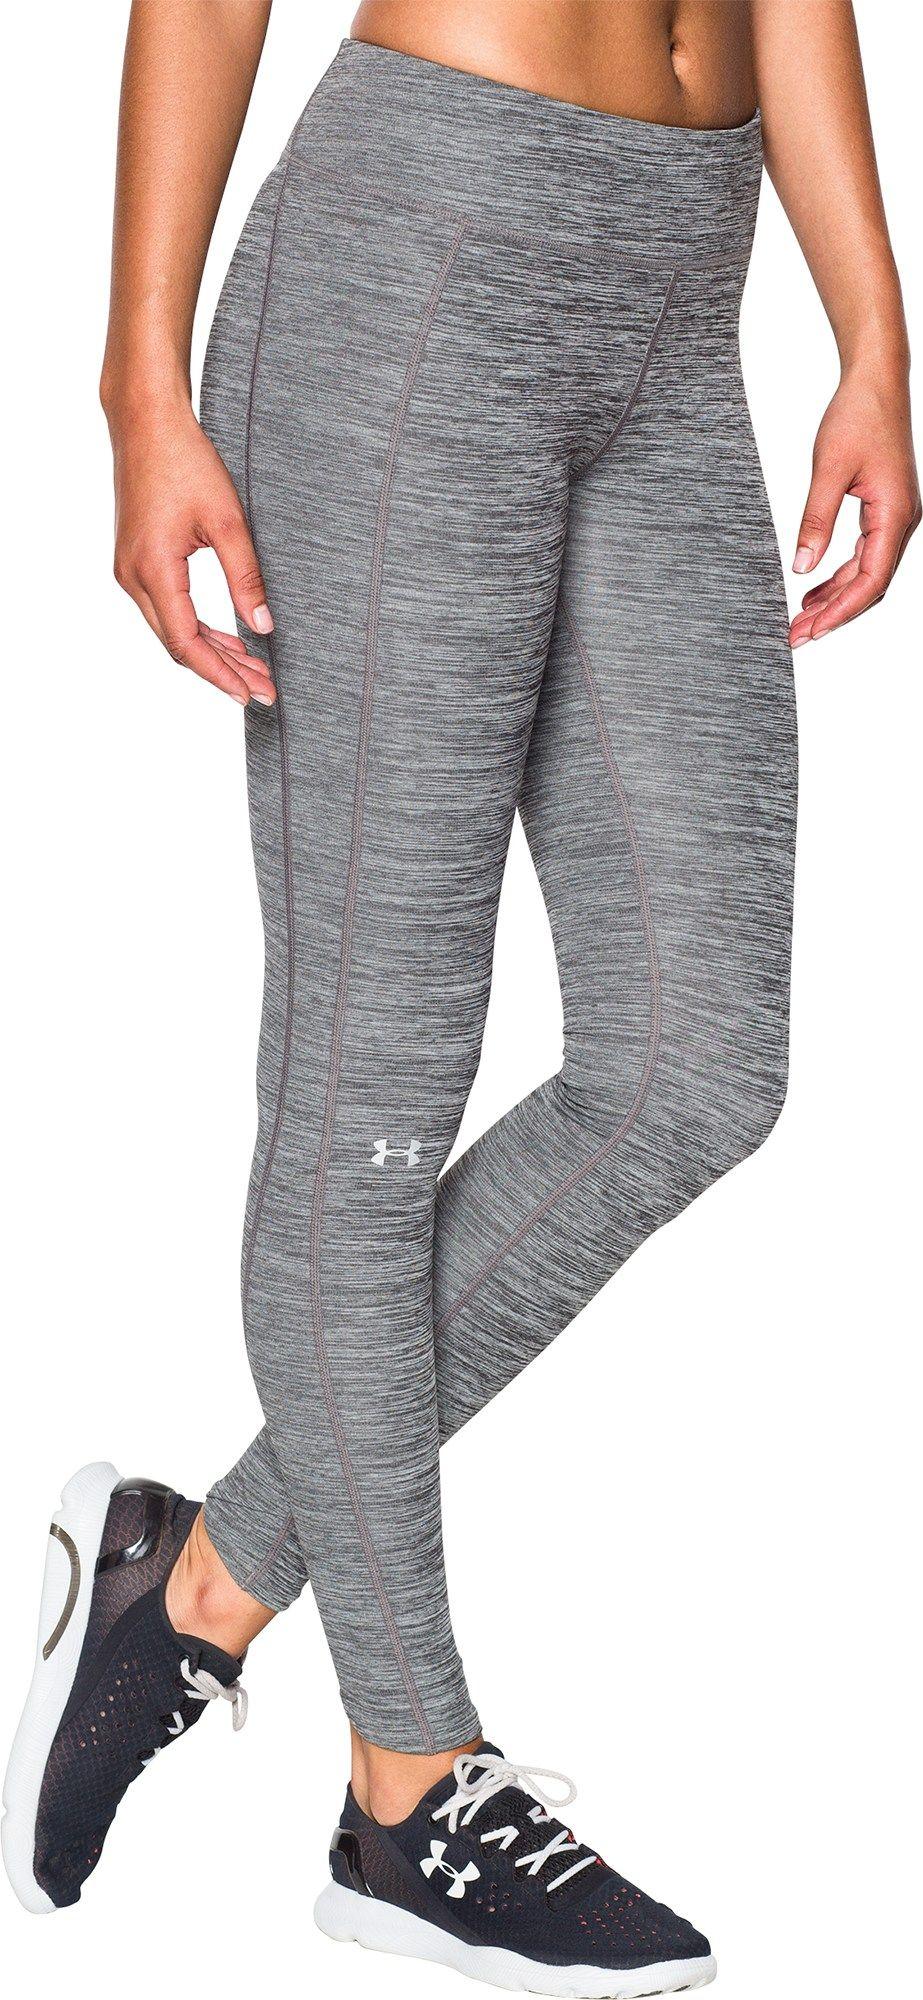 51a86776a5cd4 Under Armour Female Coldgear Leggings - Women s